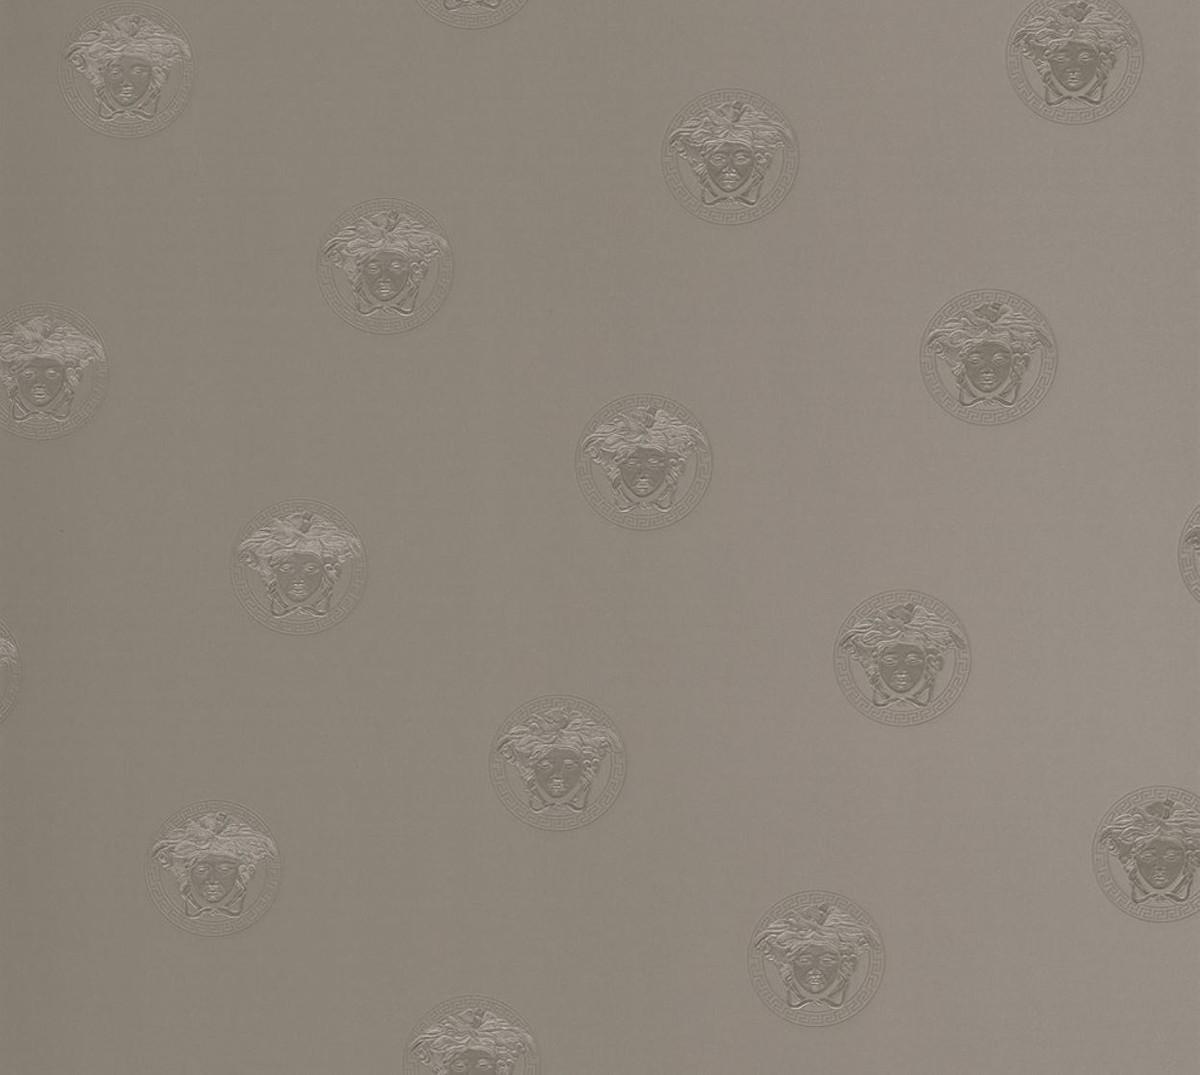 Versace Designer Barock Vliestapete Vanitas 348623 Grau / Silber - Design  Tapete - Luxus Deko Accessoires